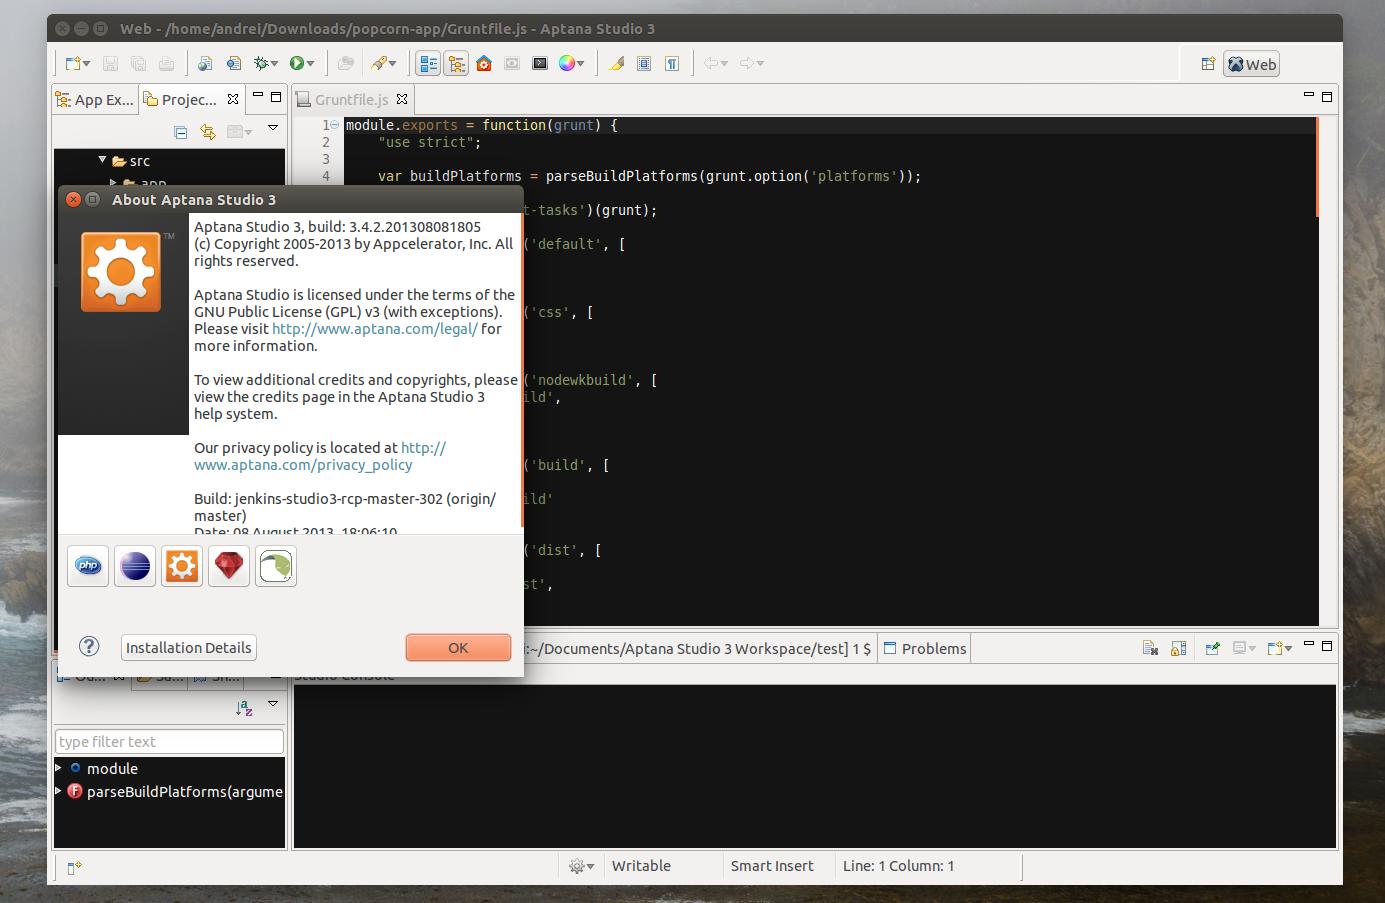 Aptana Studio 3 Ubuntu